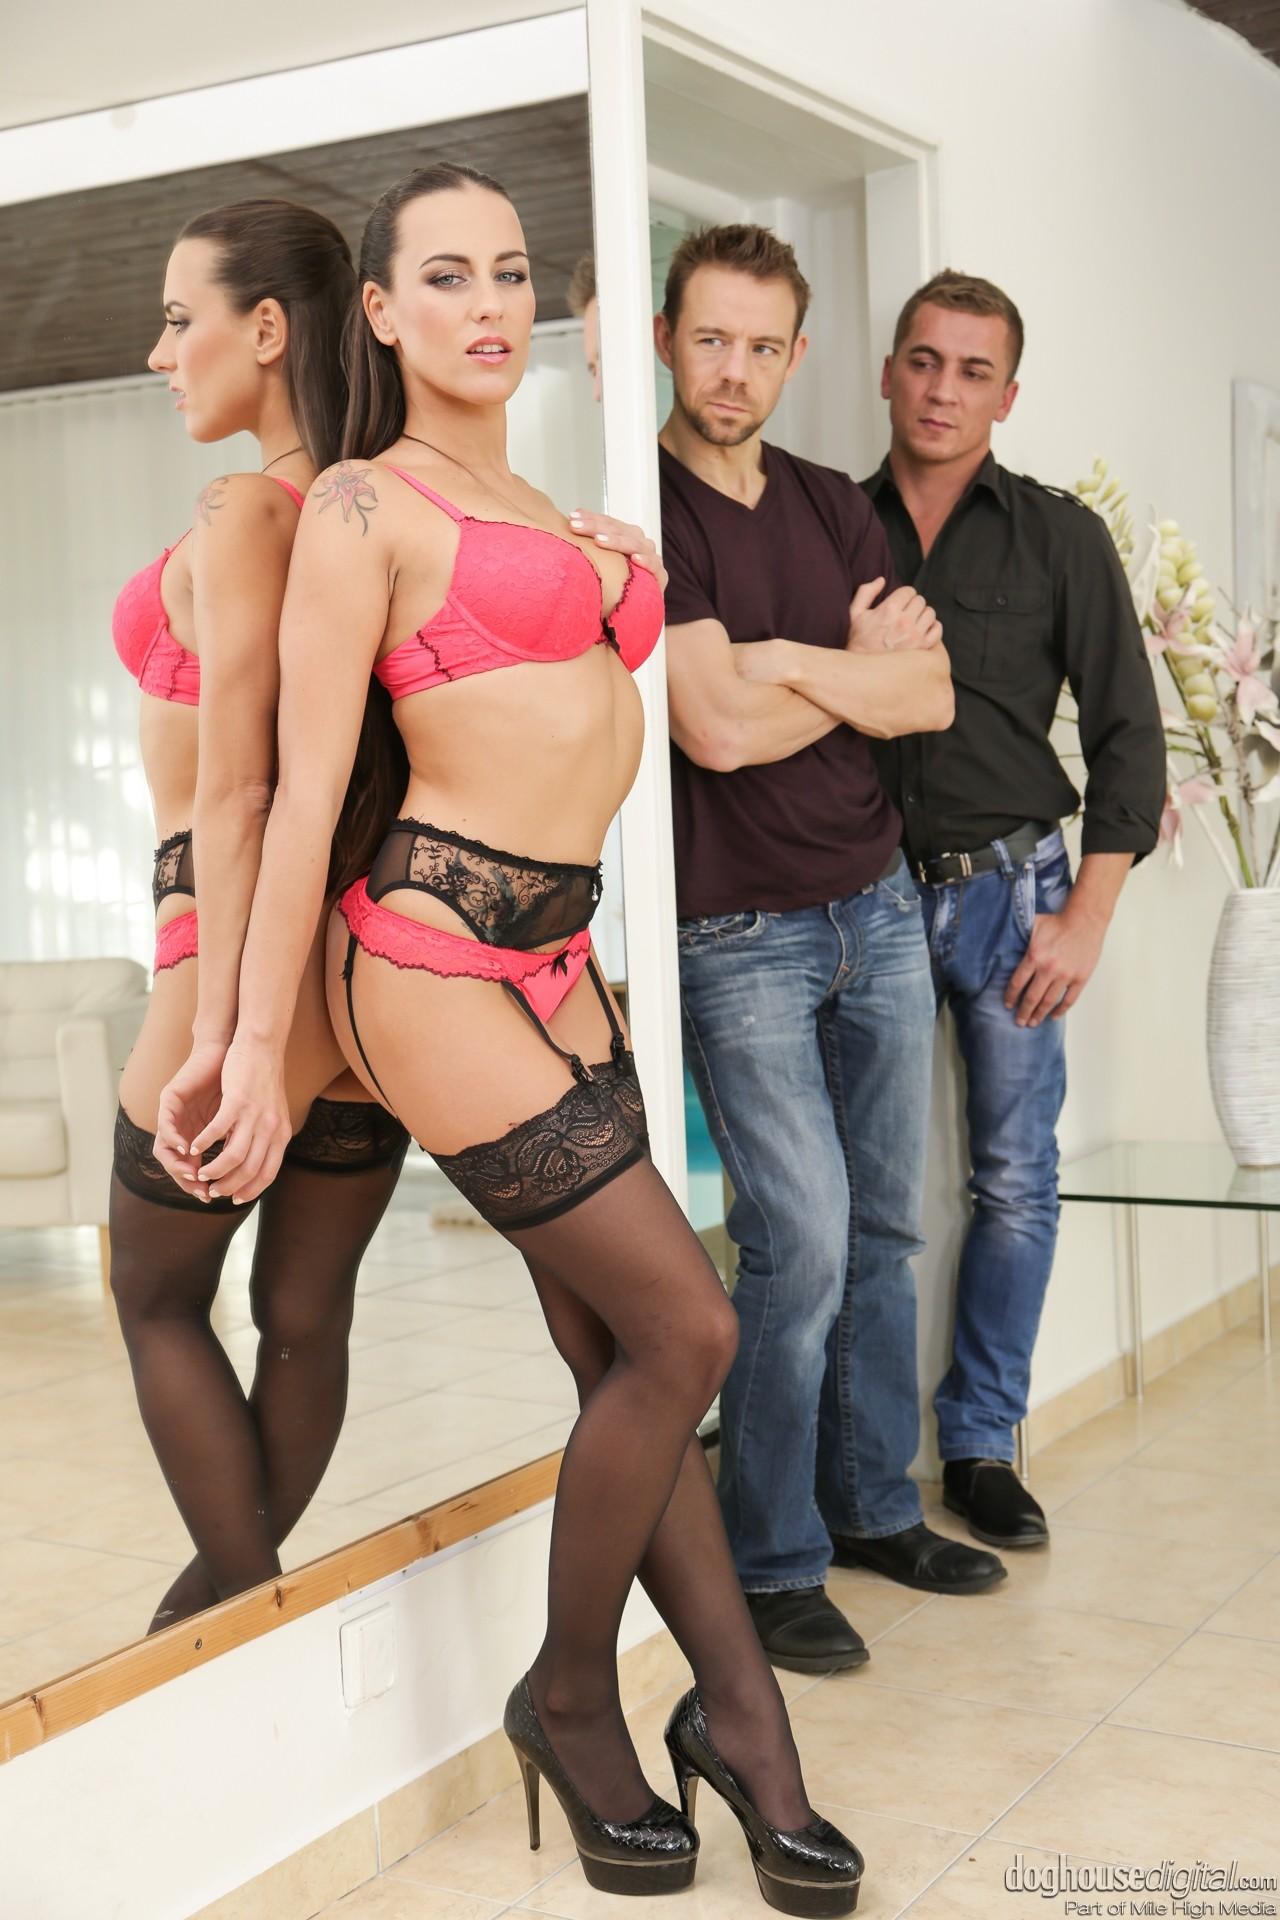 Amateur Threesome Bi Mmf Anal Bisexual threesome mmf